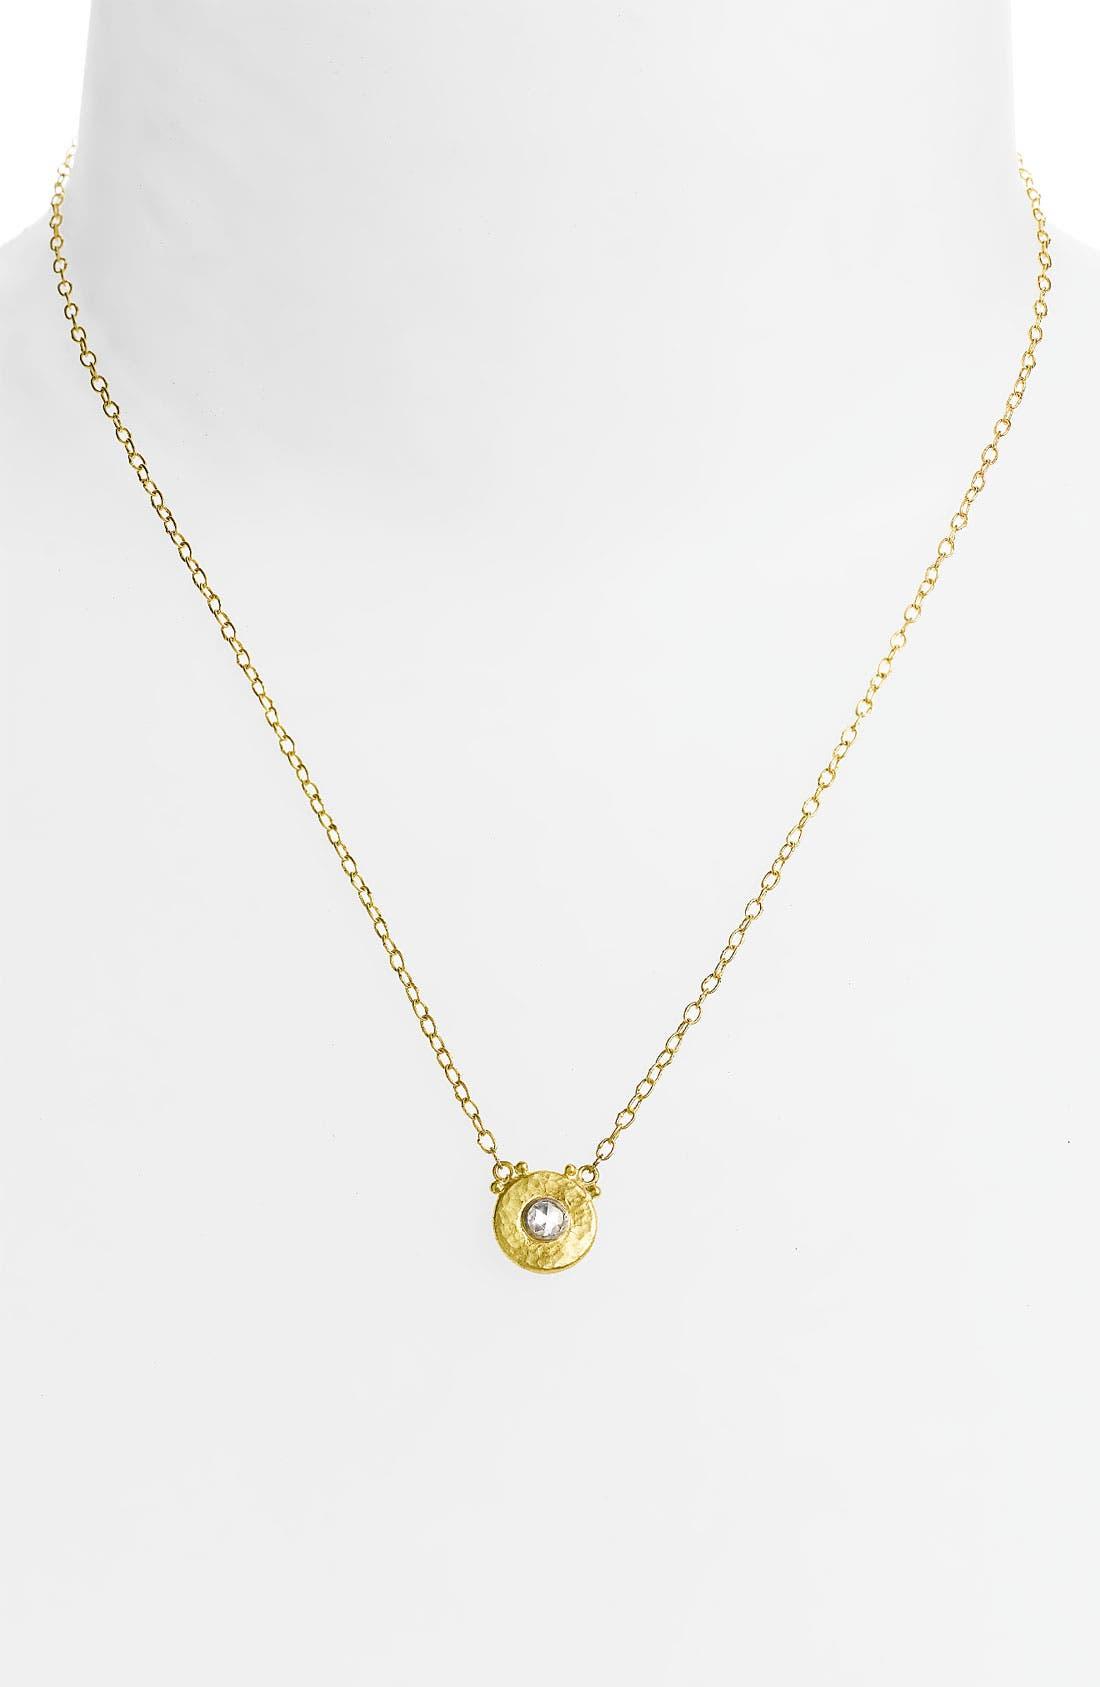 Alternate Image 1 Selected - Gurhan 'Droplet' Diamond Pendant Necklace